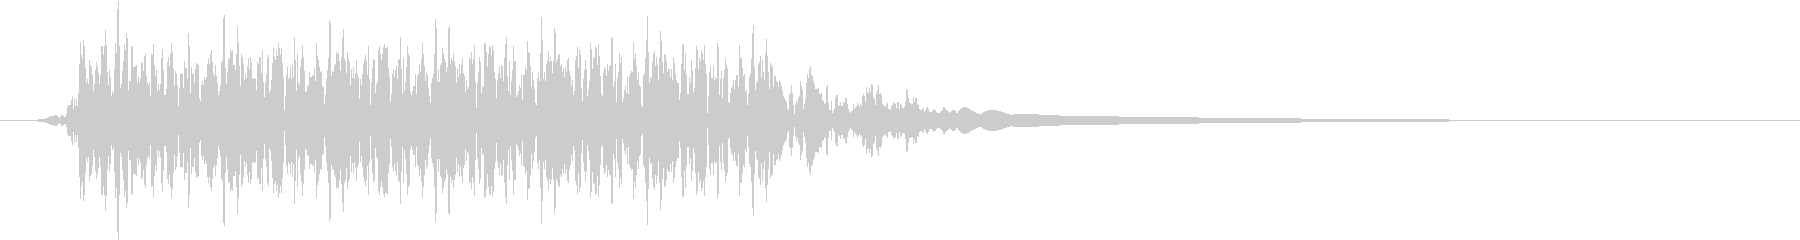 Push 汎用決定・セレクト音 10の未再生の波形